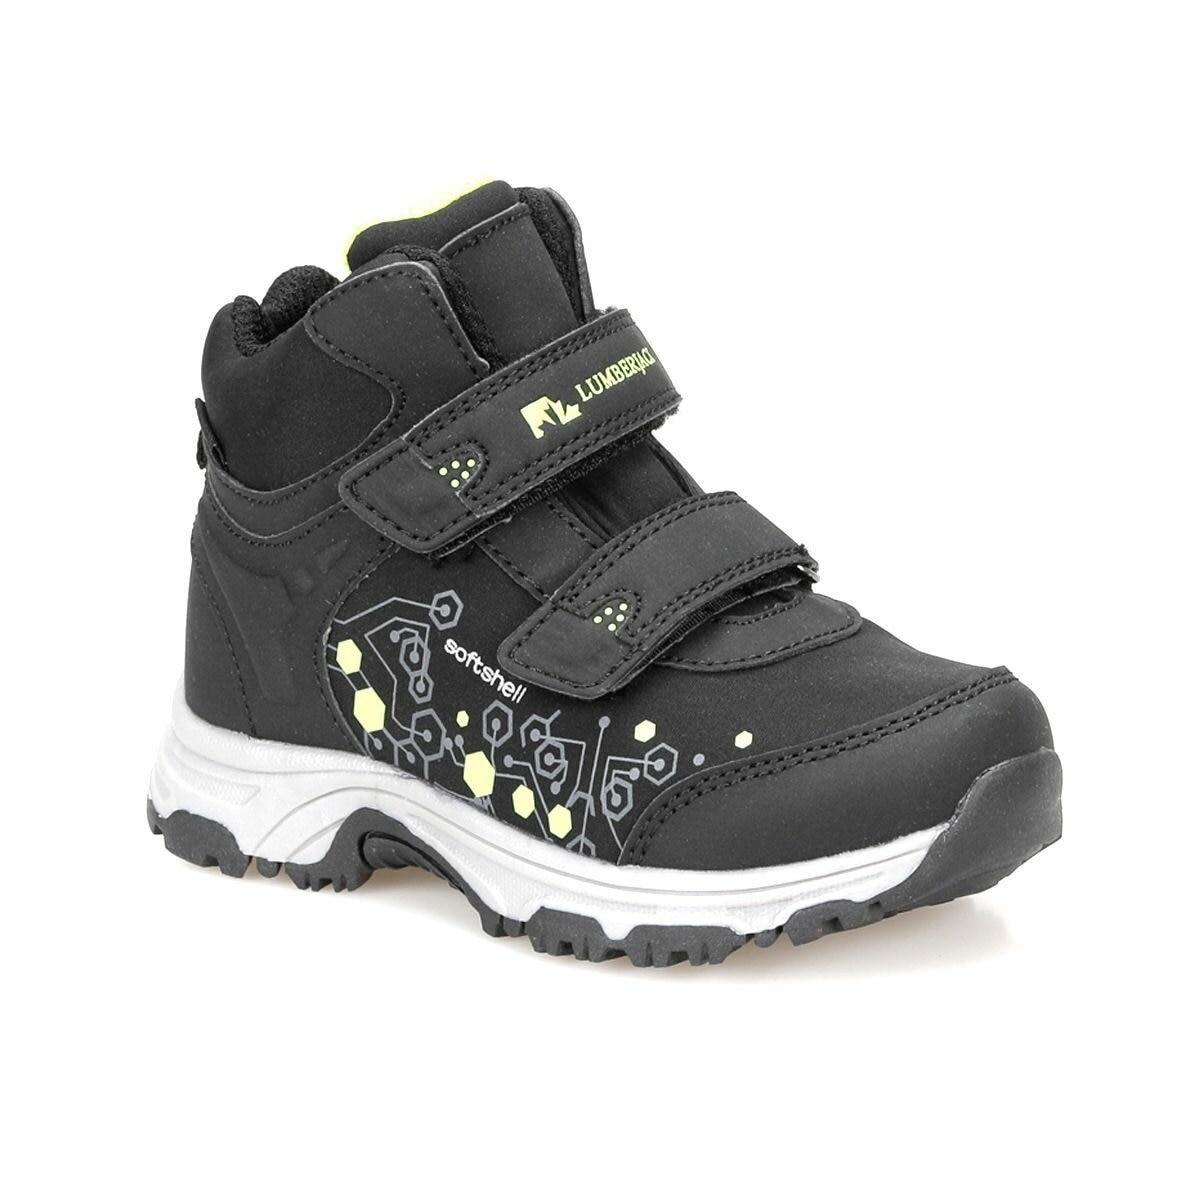 FLO SPAGO HI Black Male Child Boots LUMBERJACK